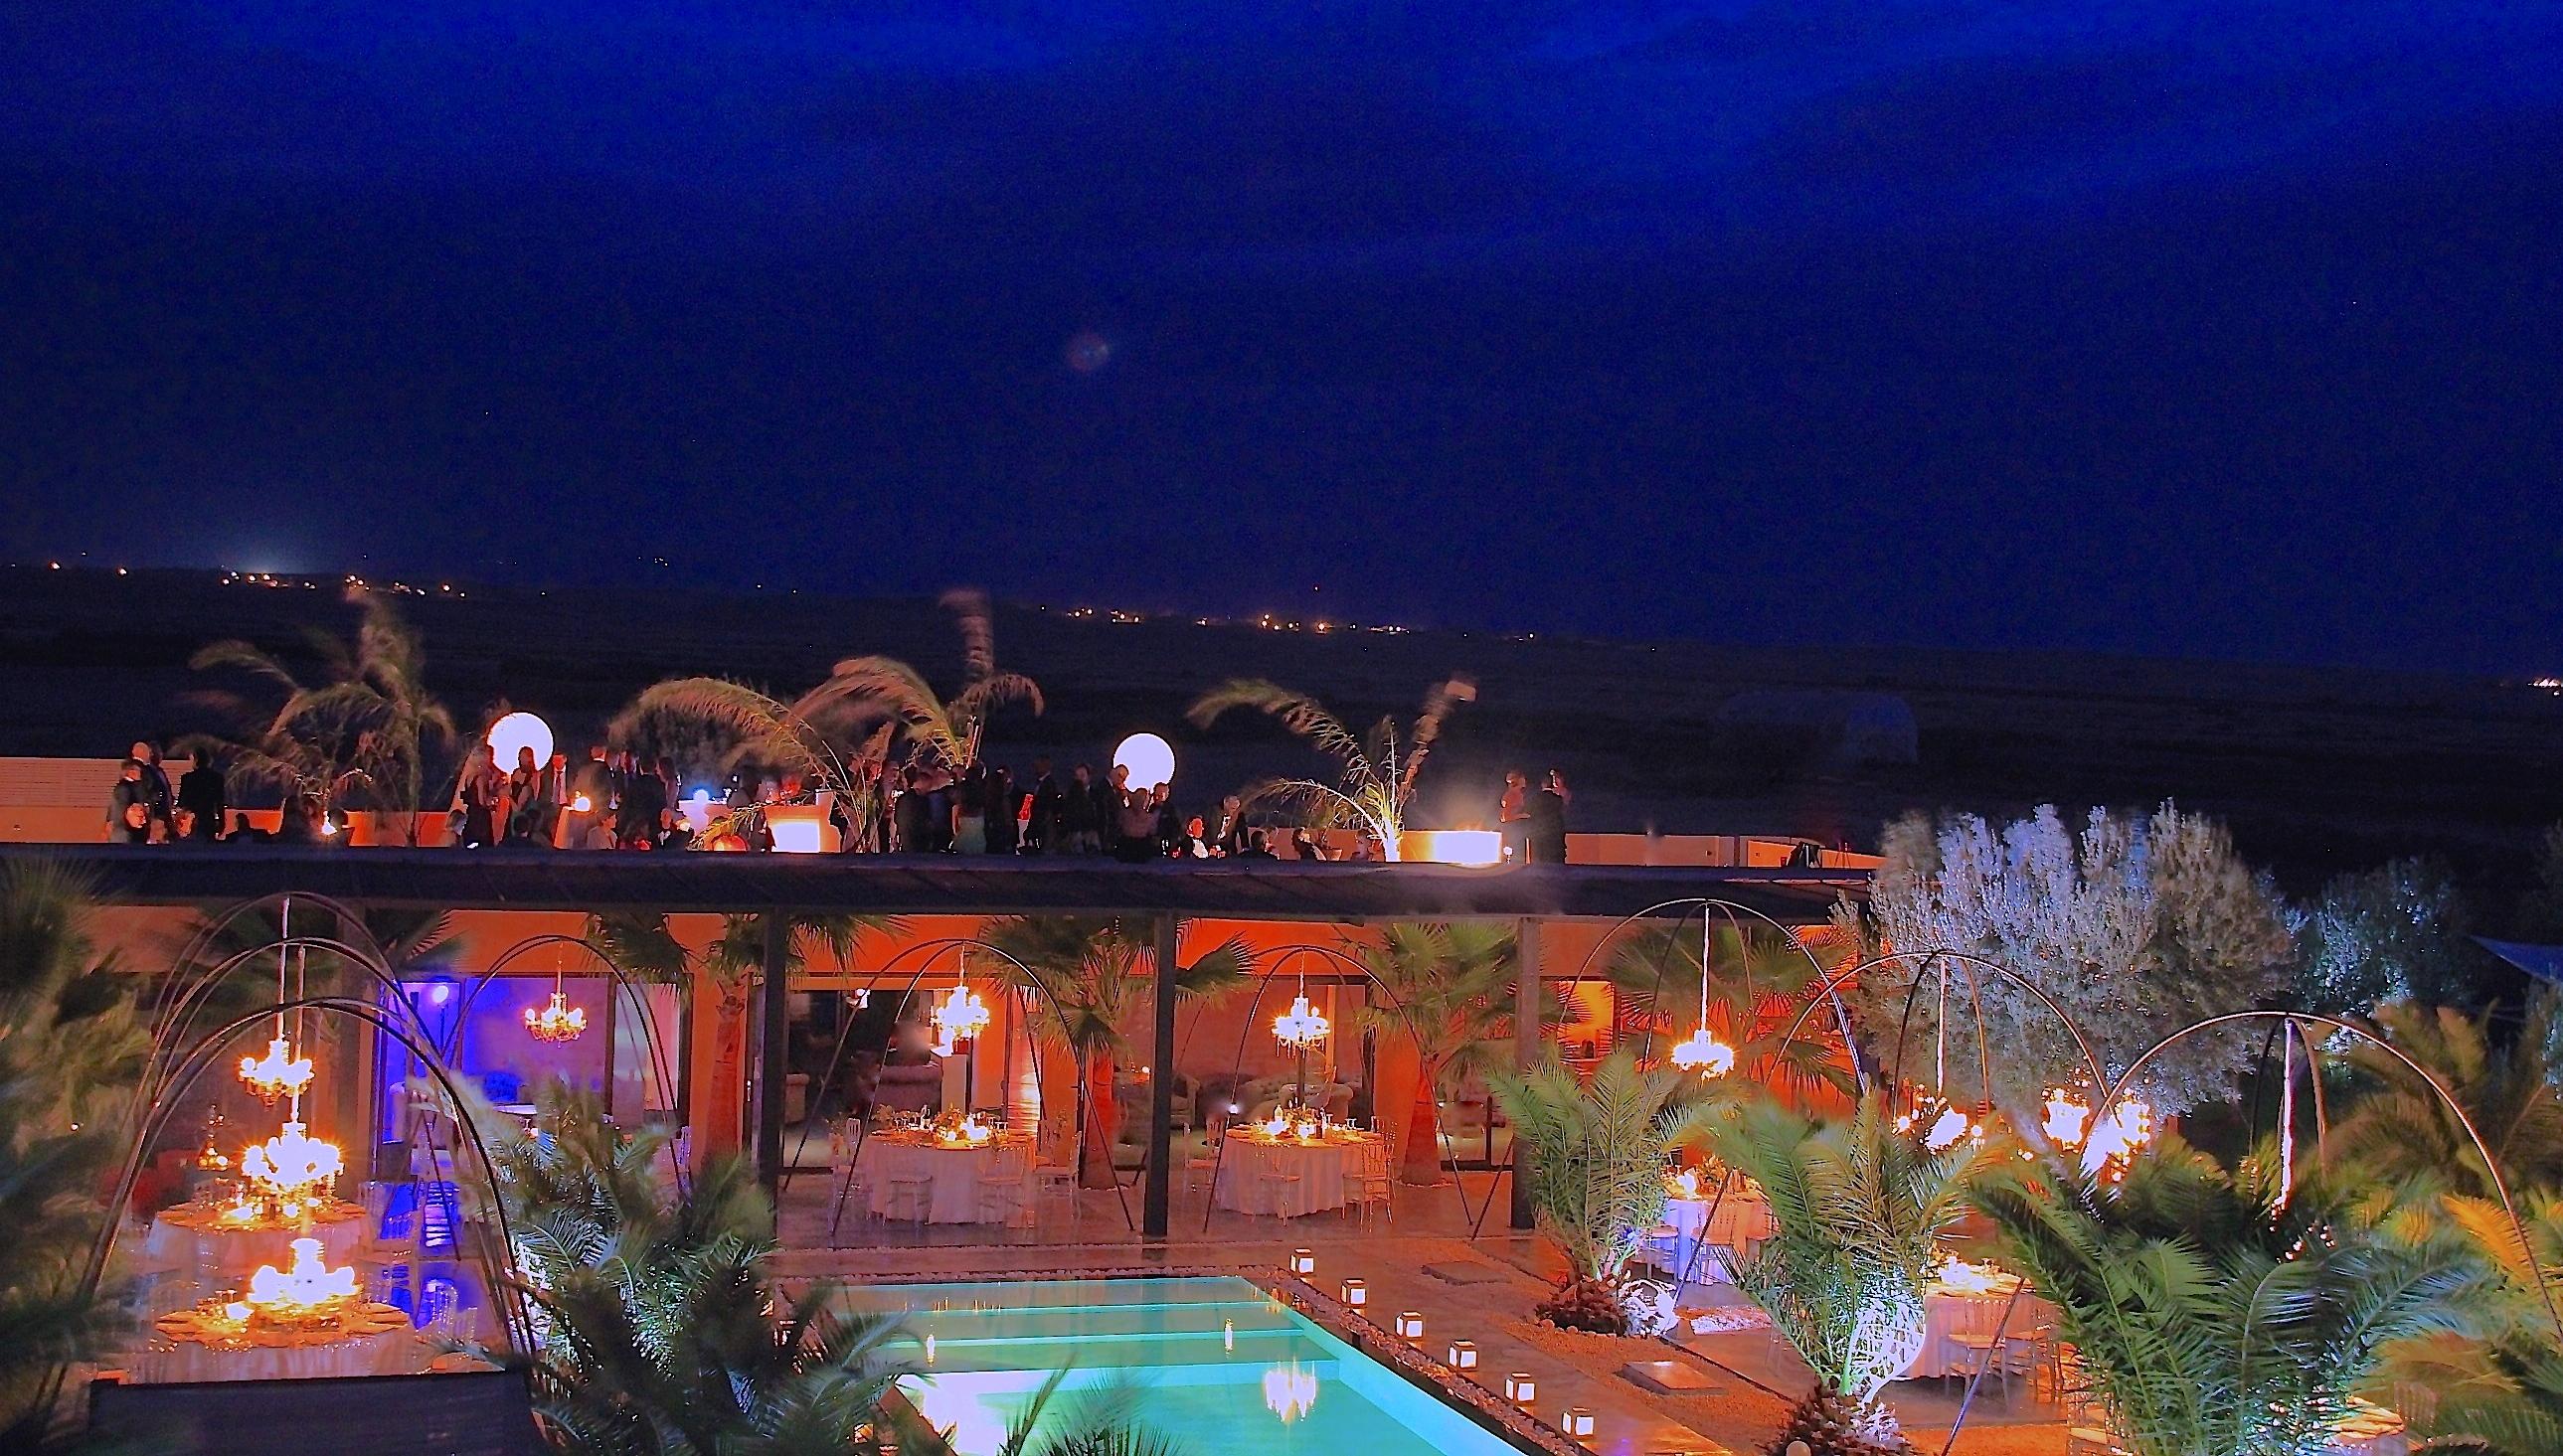 mariage au maroc a marrakech